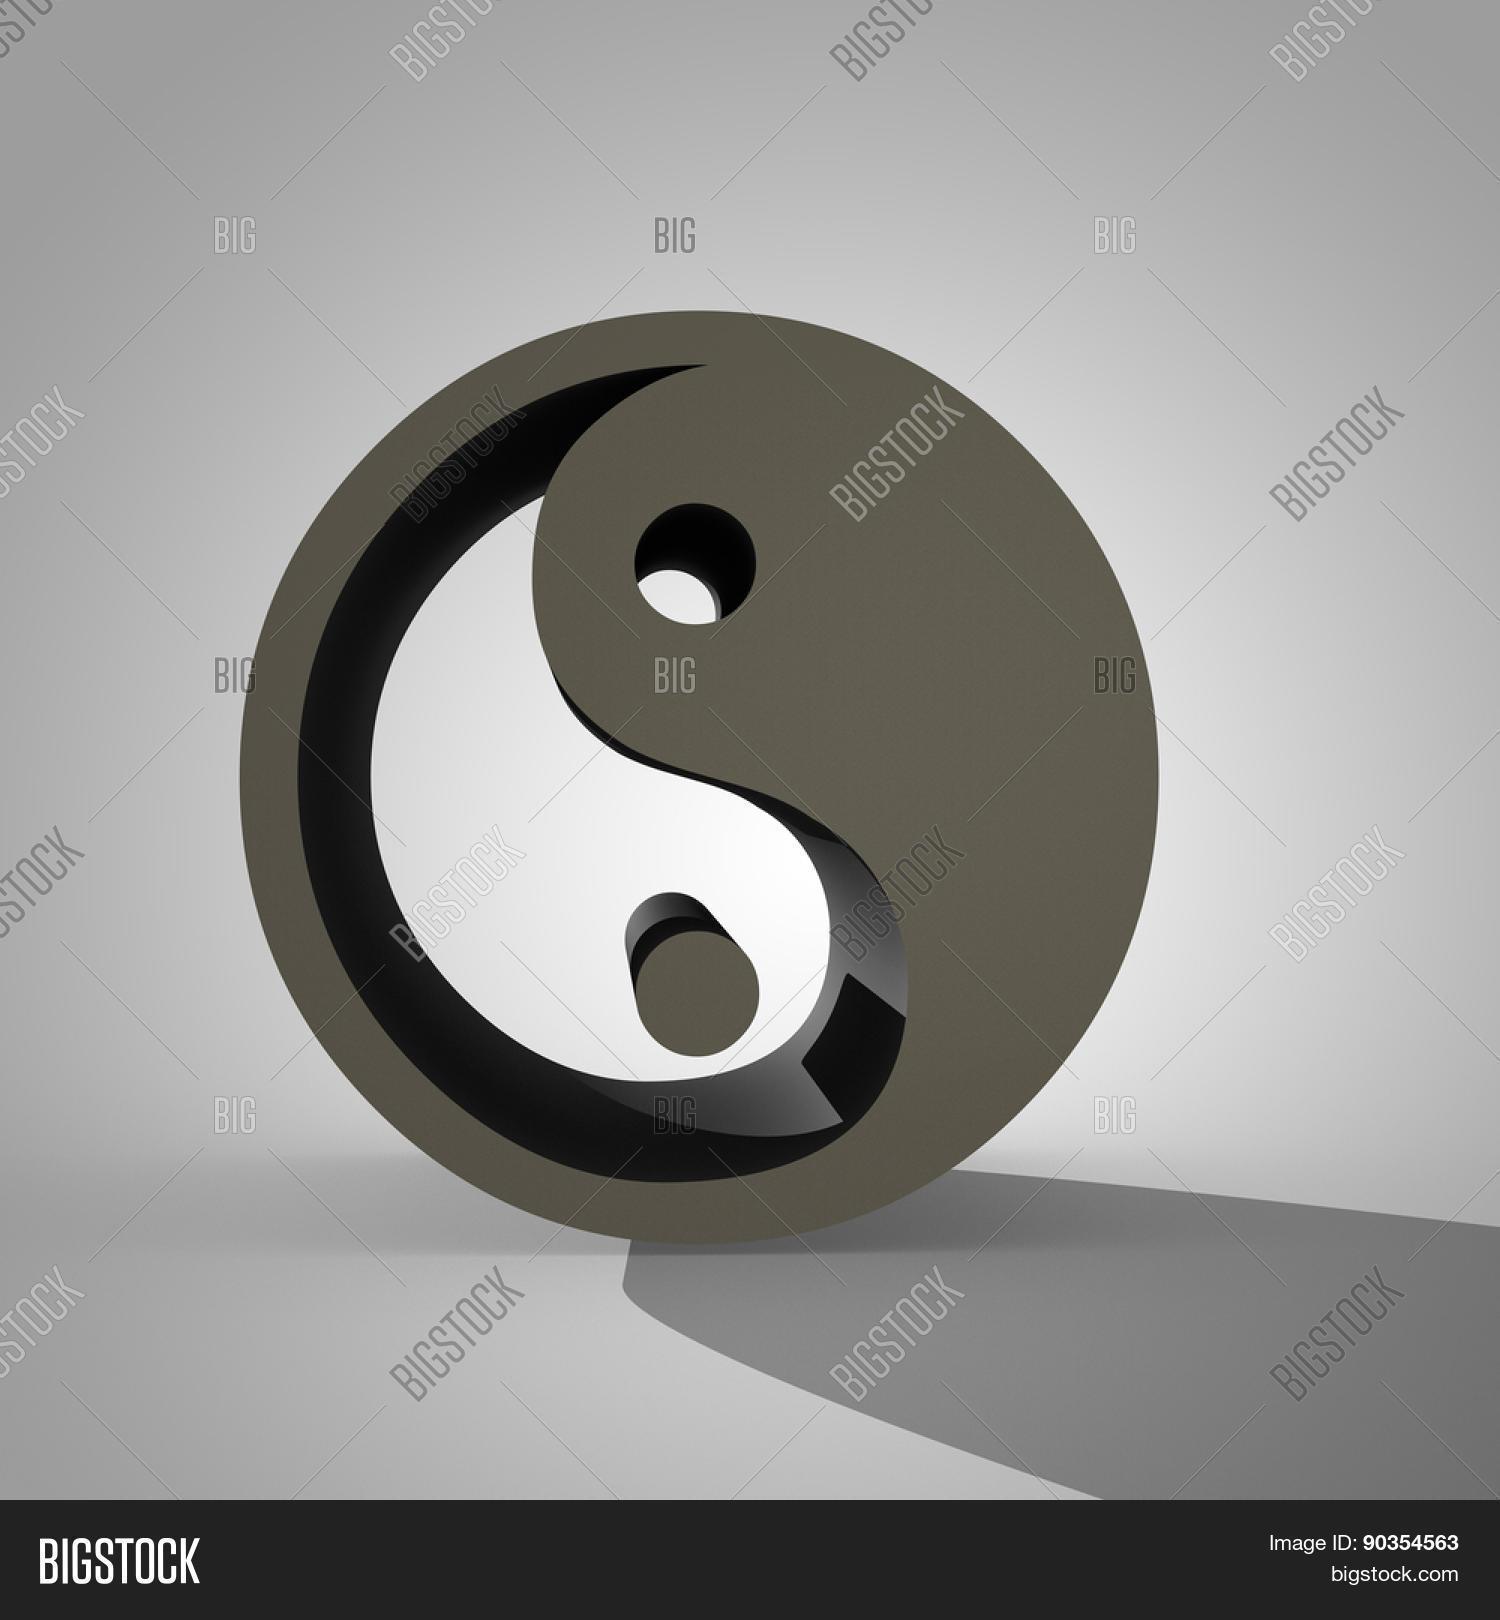 3d Yin Yang Sign Dual Image Photo Free Trial Bigstock